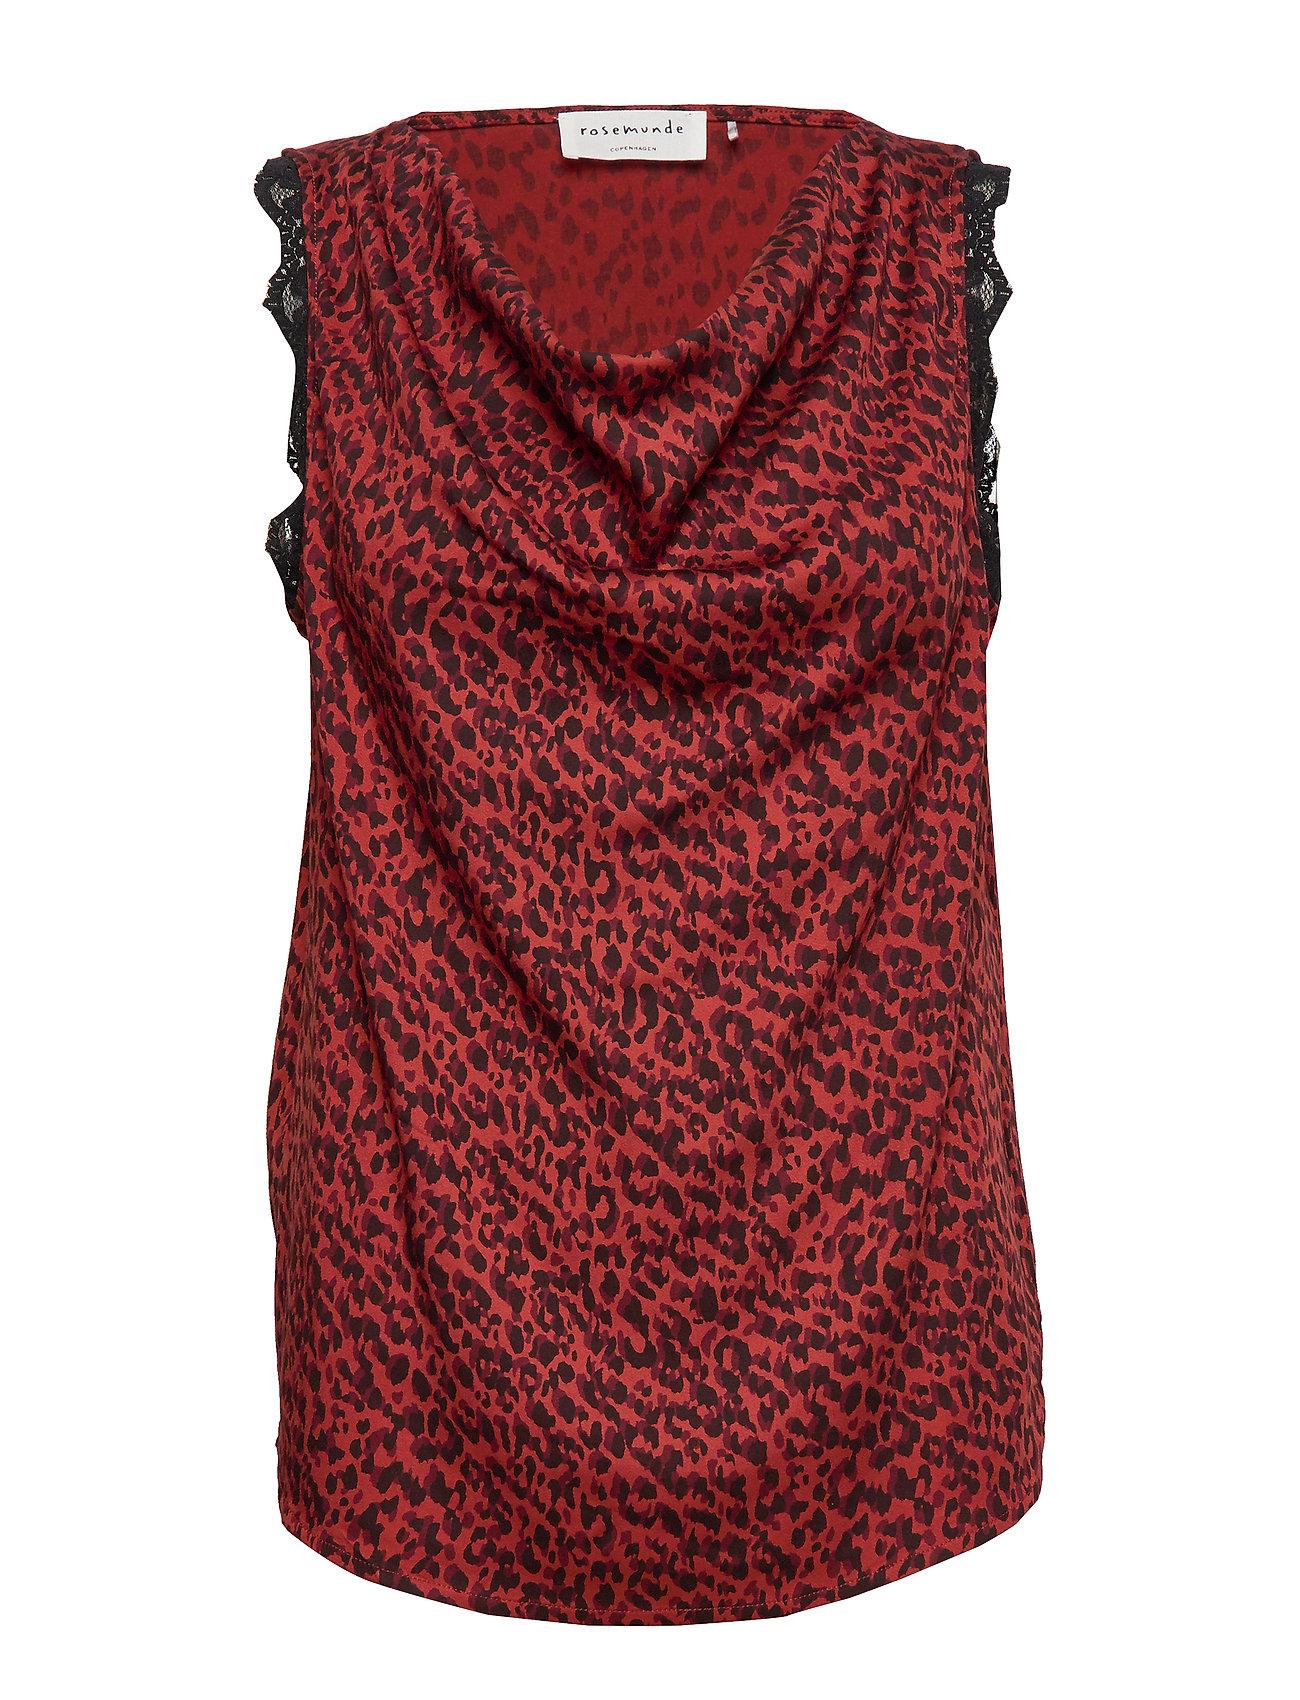 Rosemunde Top - RED SHADOW LEOPARD PRINT